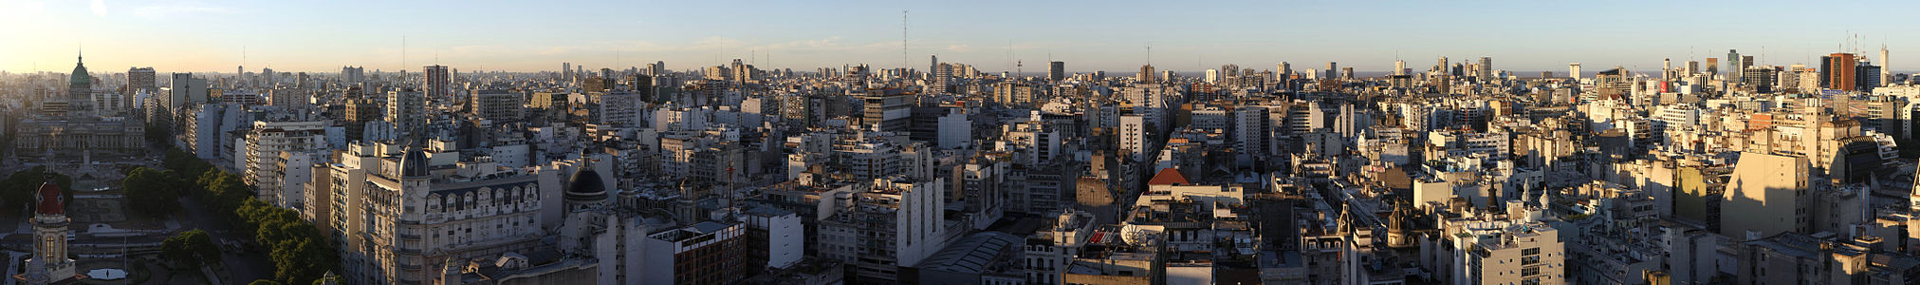 Foto panorâmica de Buenos Aires